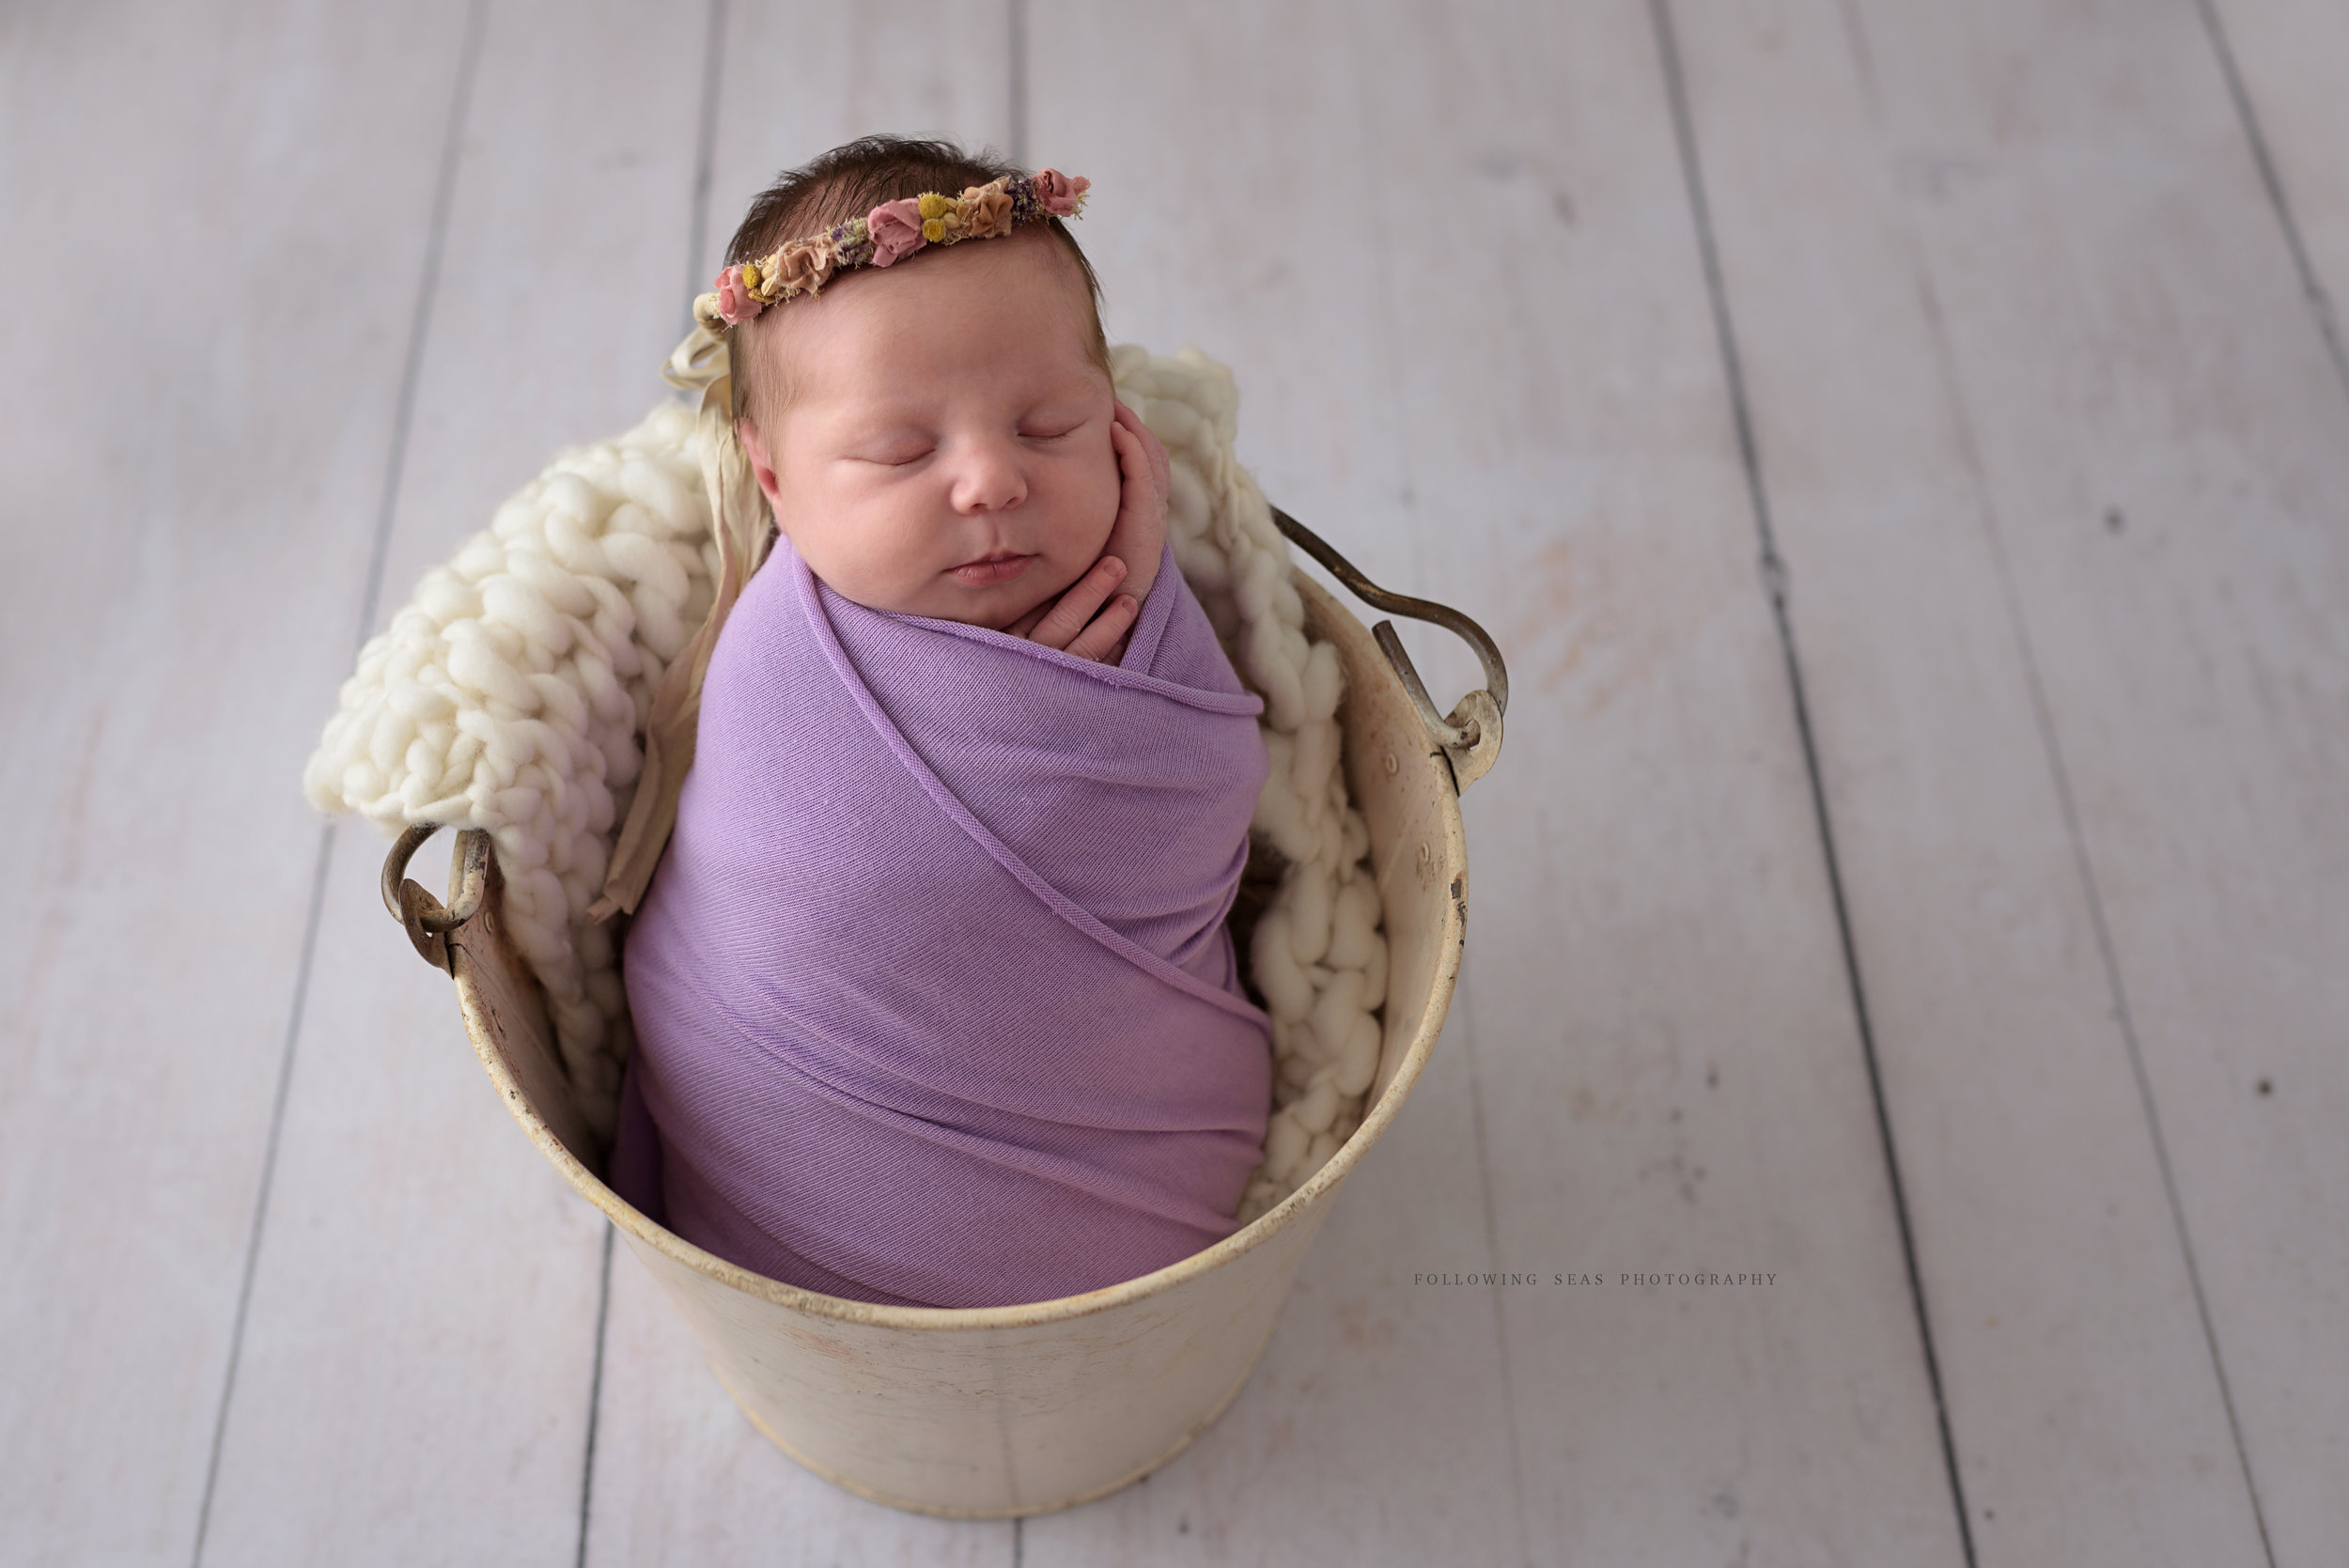 Charleston-Newborn-Photographer-Following-Seas-Photography-fsp_5088.jpg